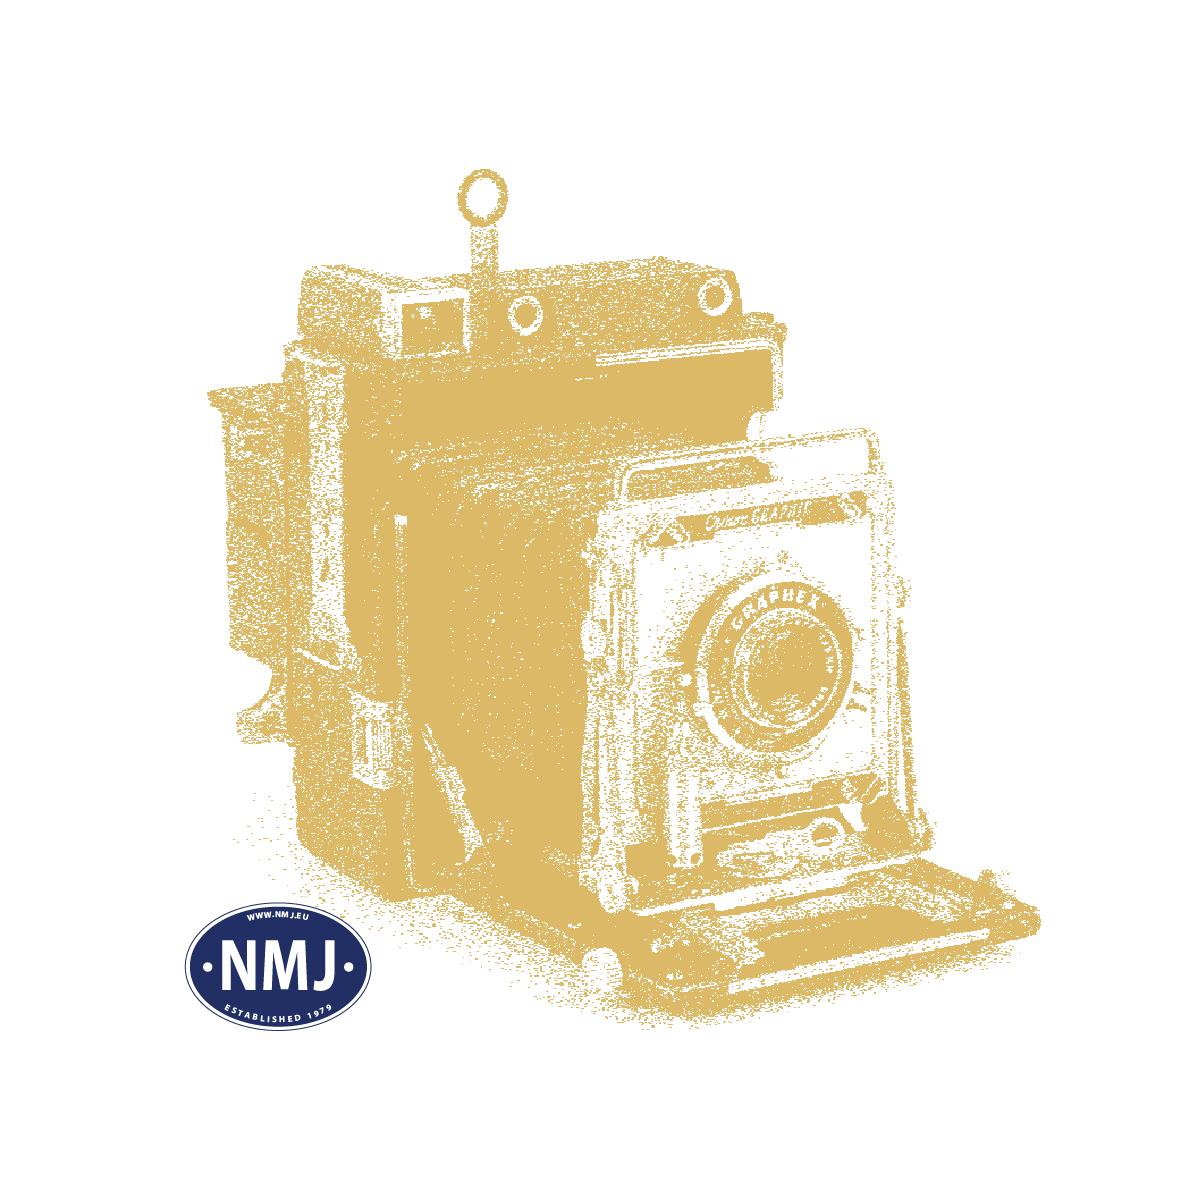 NMJT90204 - NMJ Topline MAV Diesellok M61.020, Nohab DCC Sound